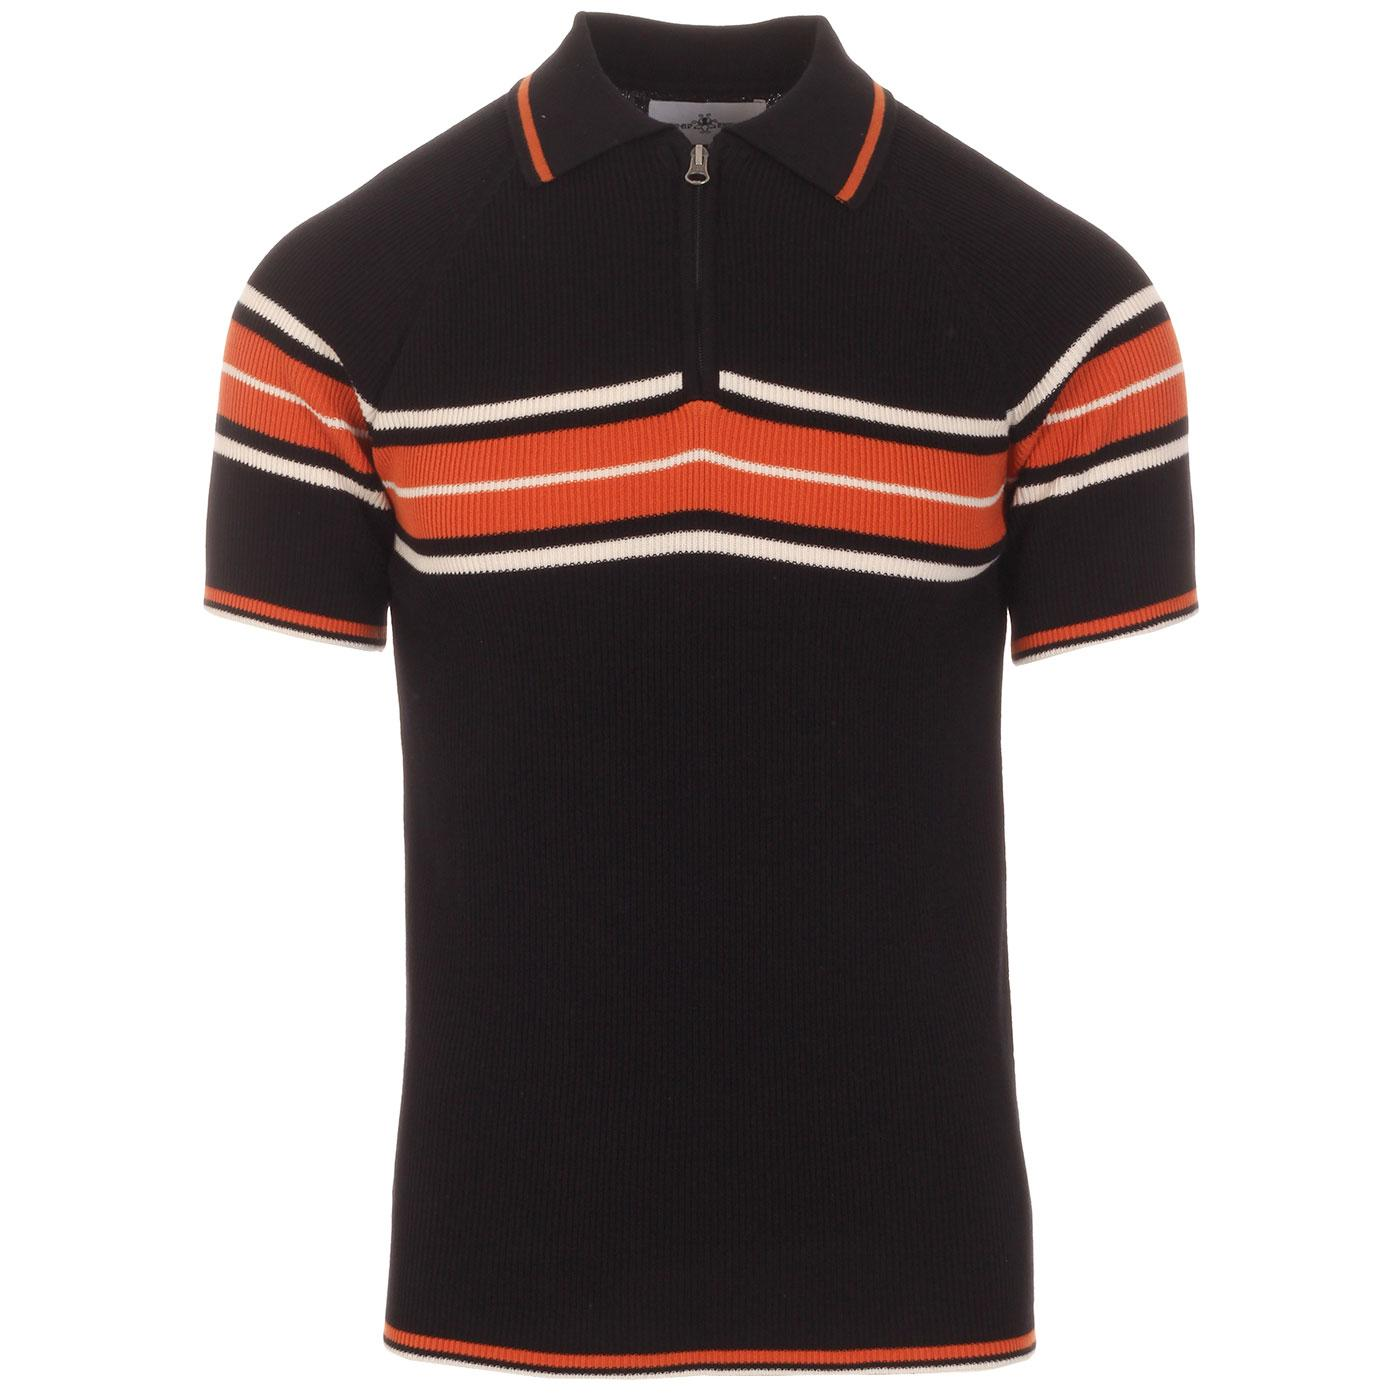 Madcap England Fireball Men's 1960s Mod Ribbed Stripe Zip Neck Polo Shirt in Black